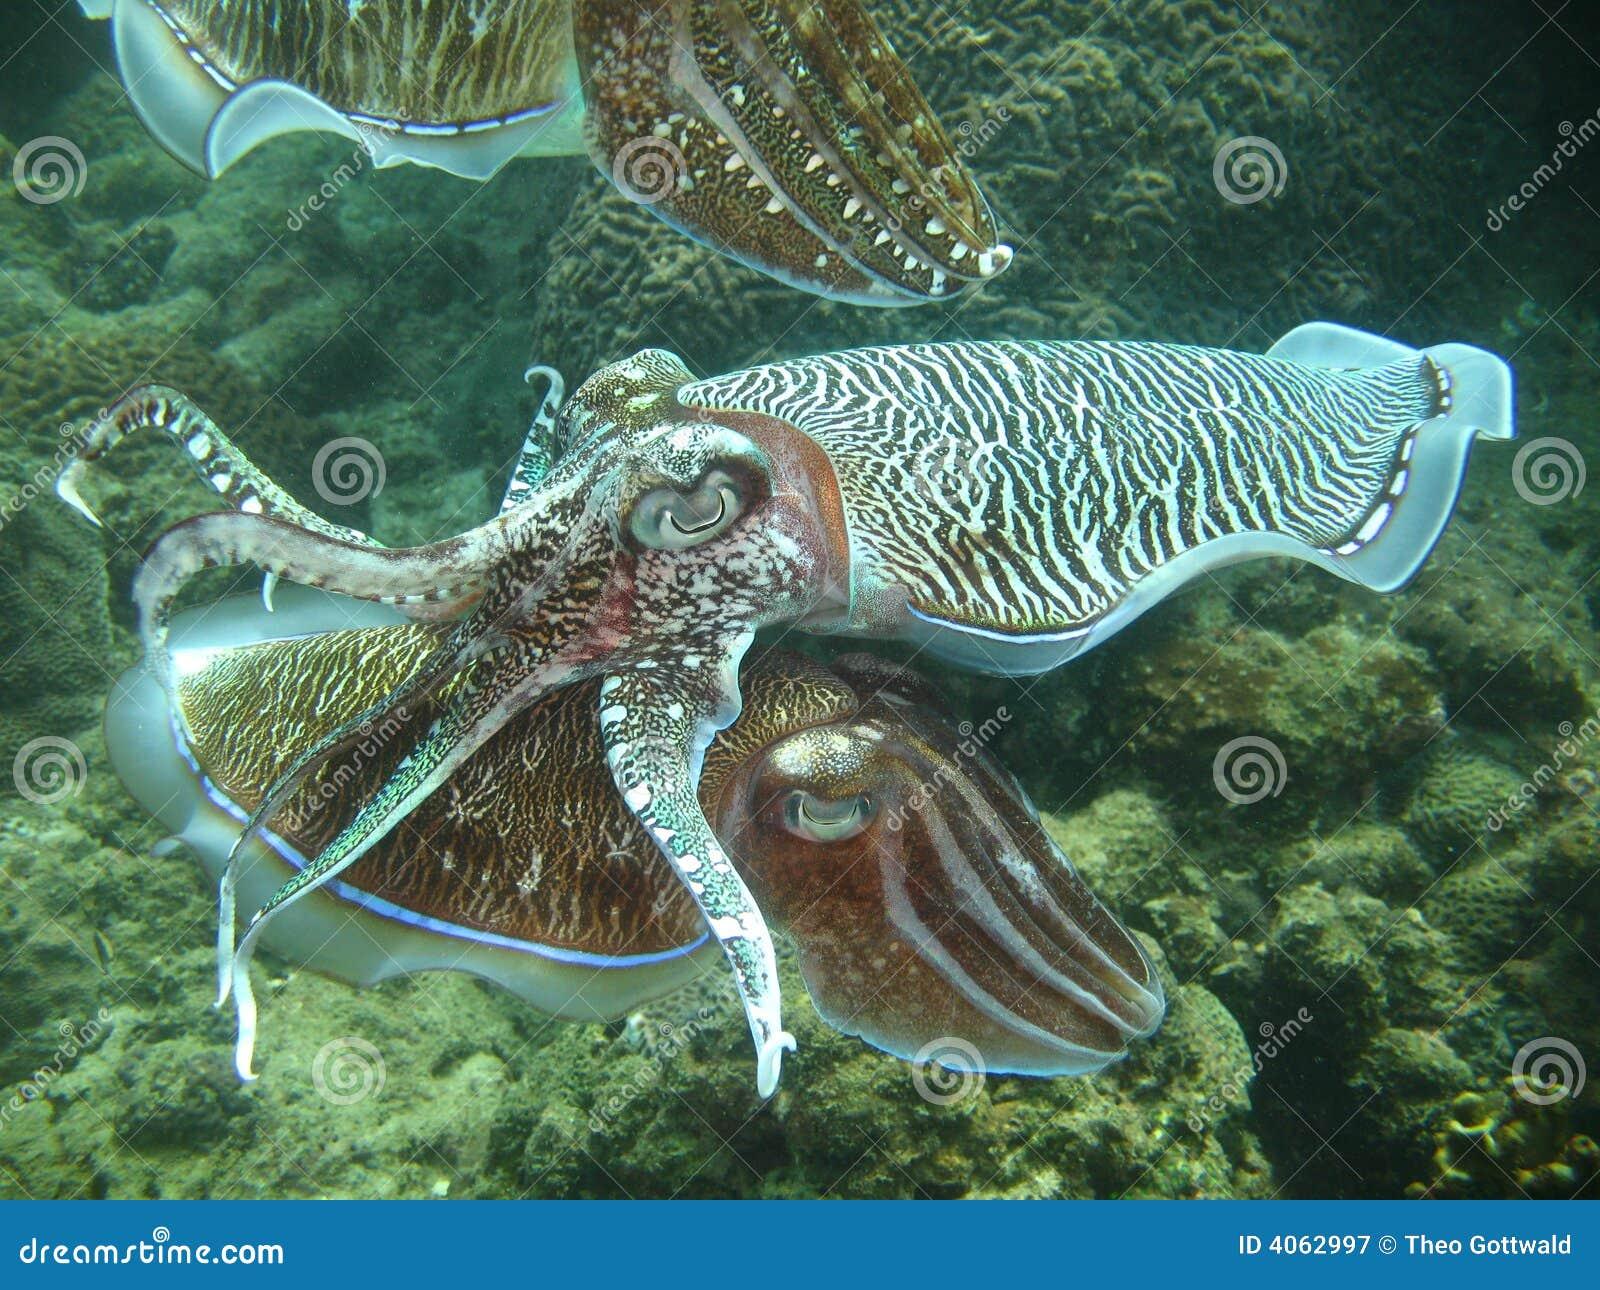 Exotic Aquatic Sea Life Royalty Free Stock Photography - Image ...